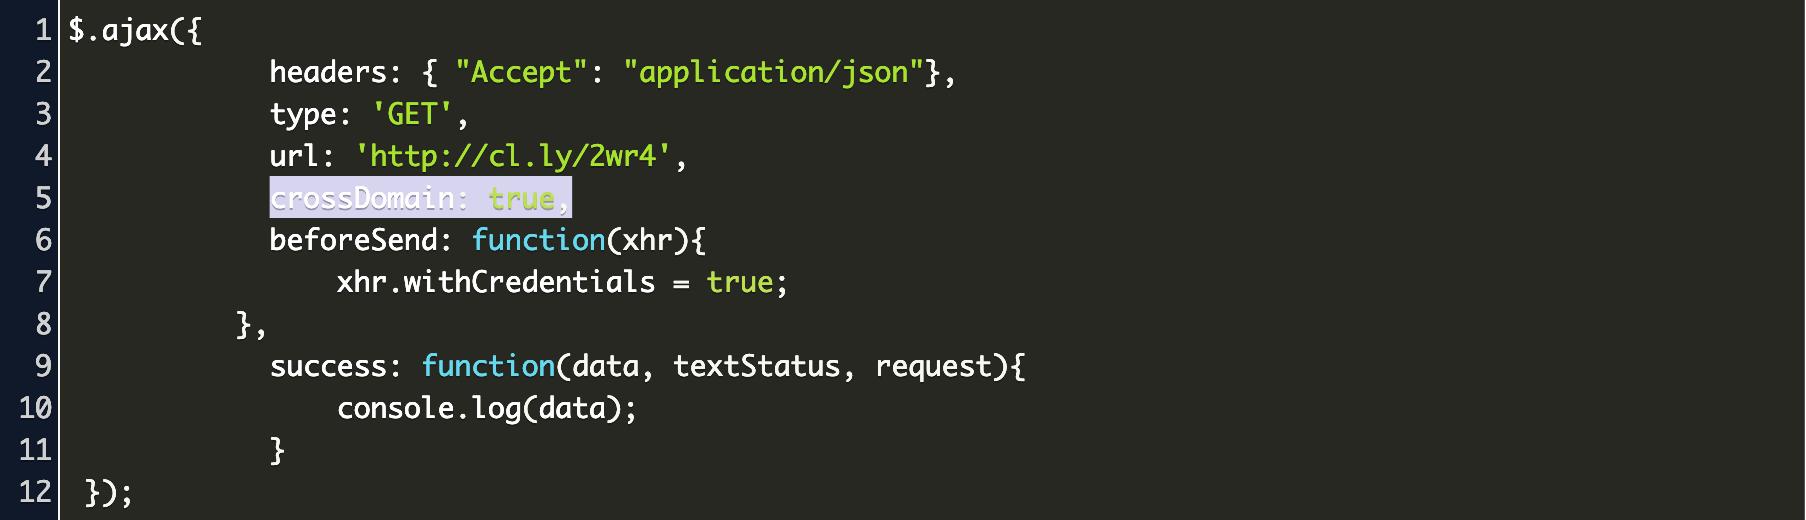 simple cors error fix Code Example